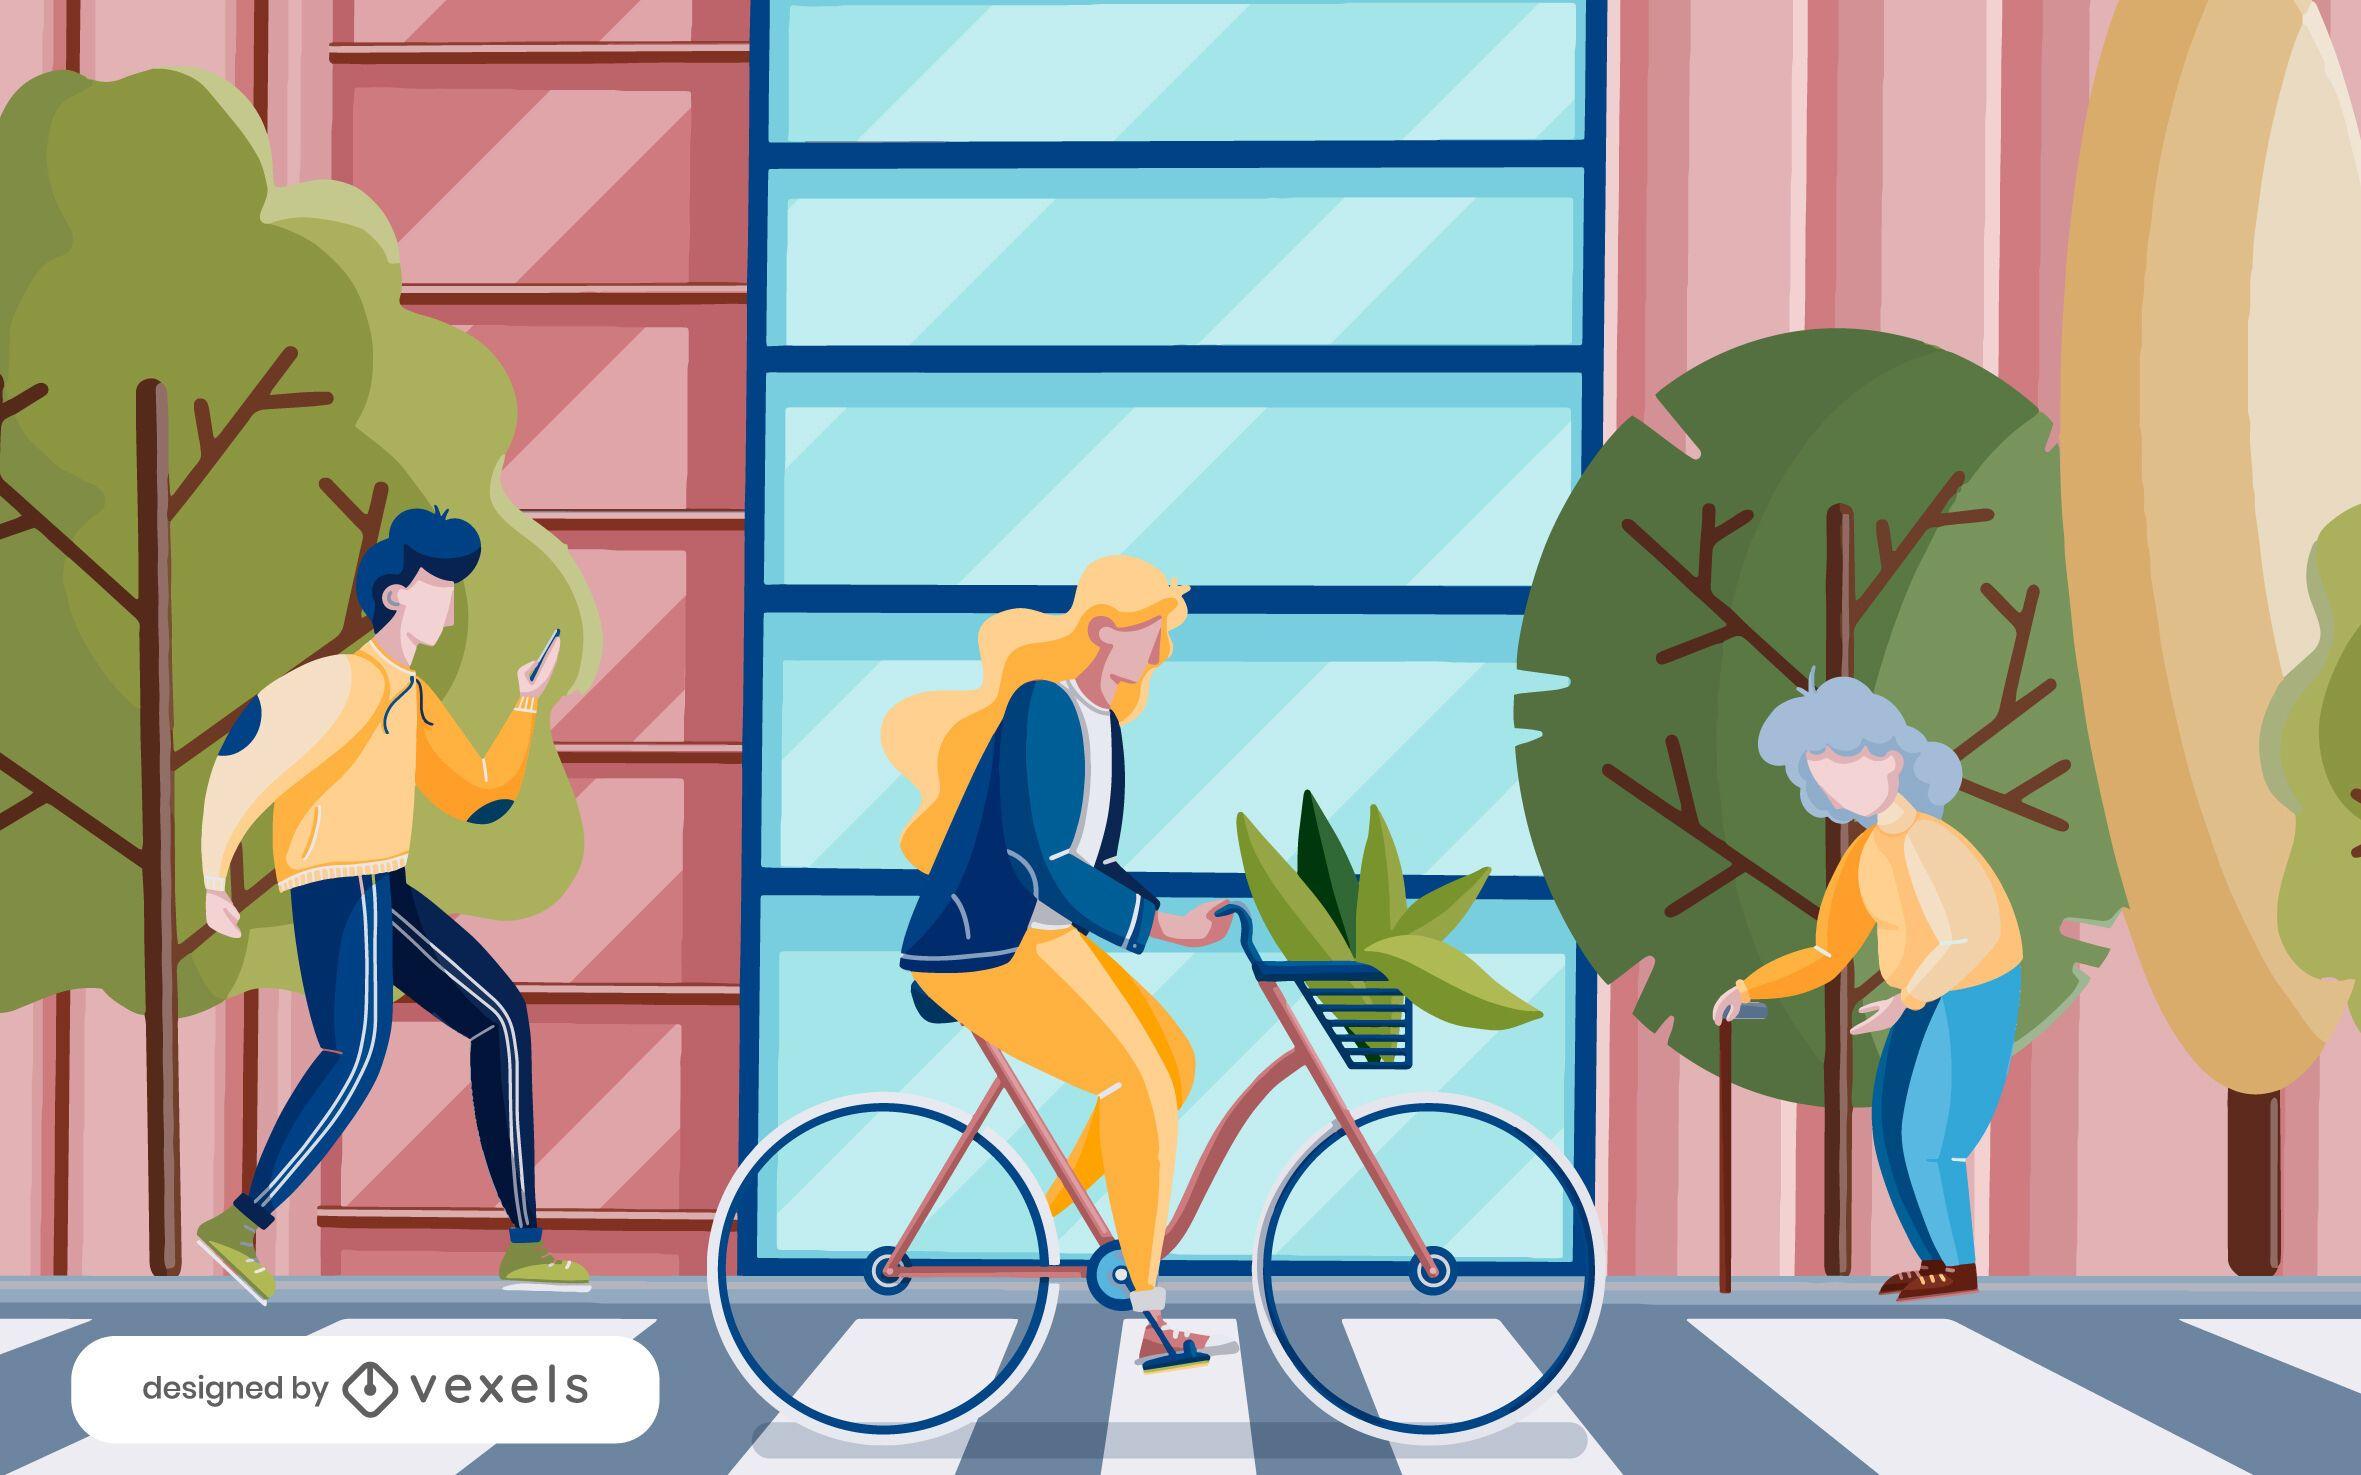 people crosswalk illustration design